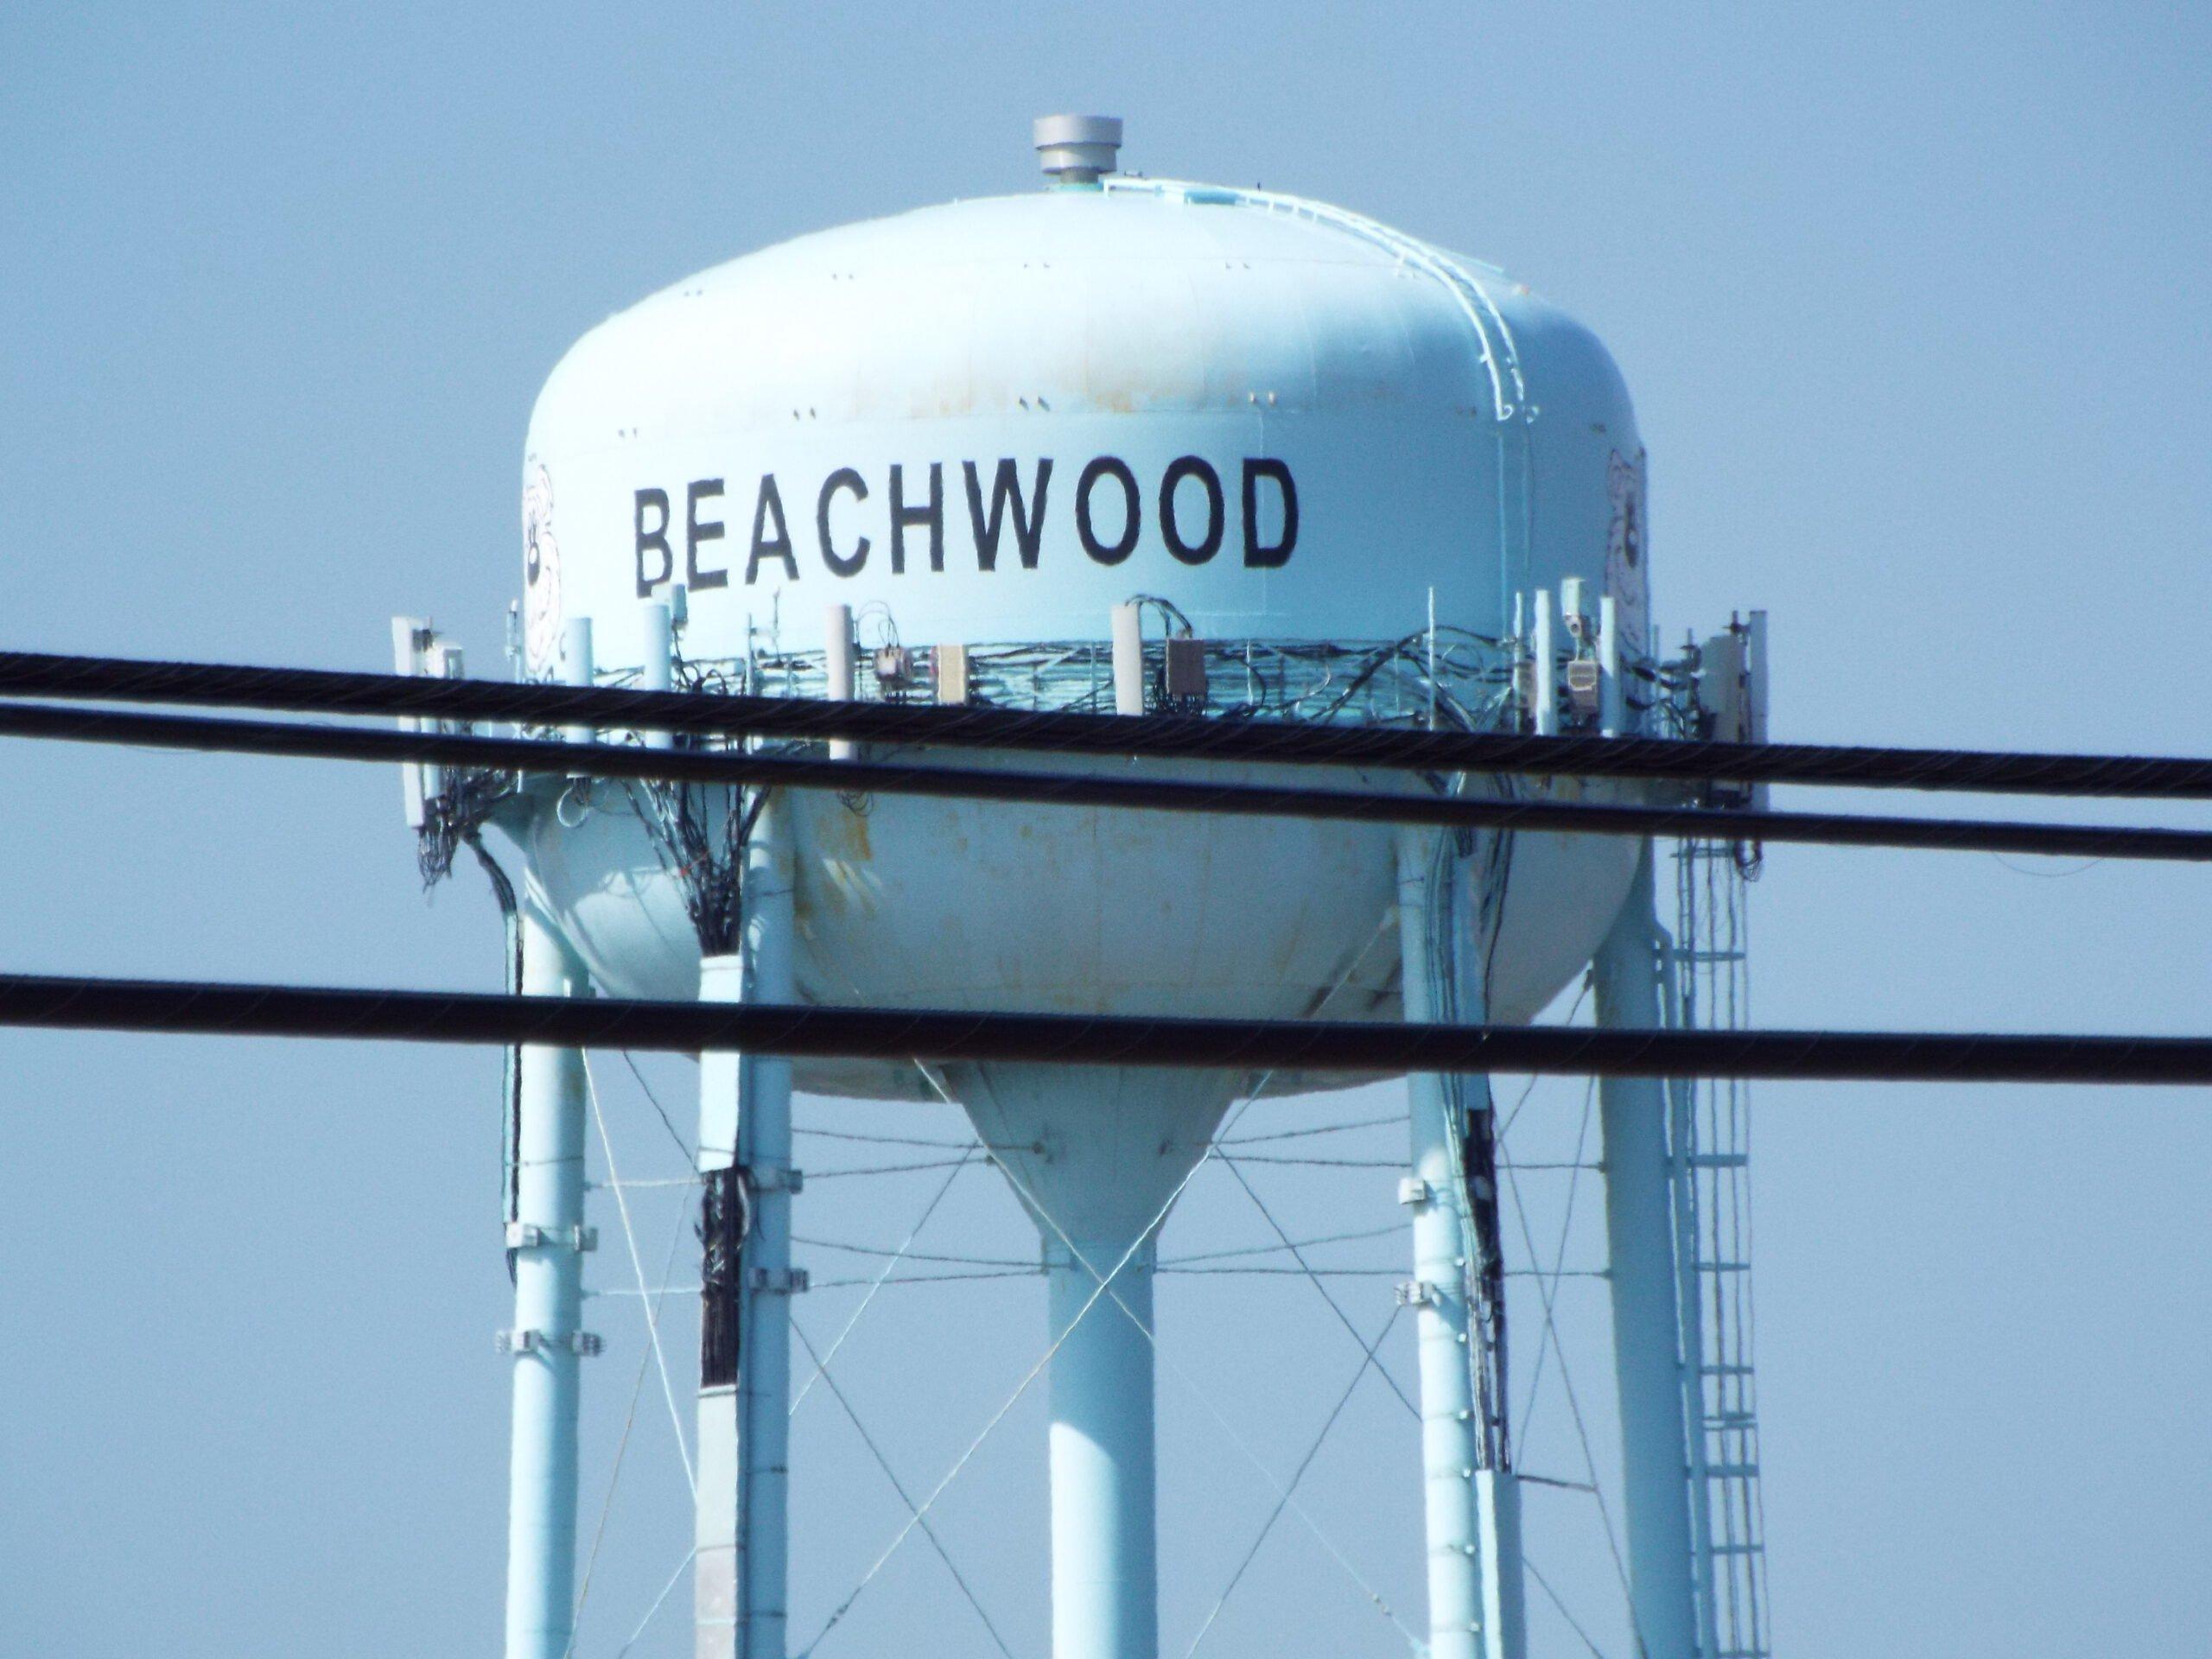 BEACHWOOD: Head-On Crash on Double Trouble Road- Possible Hit & Run